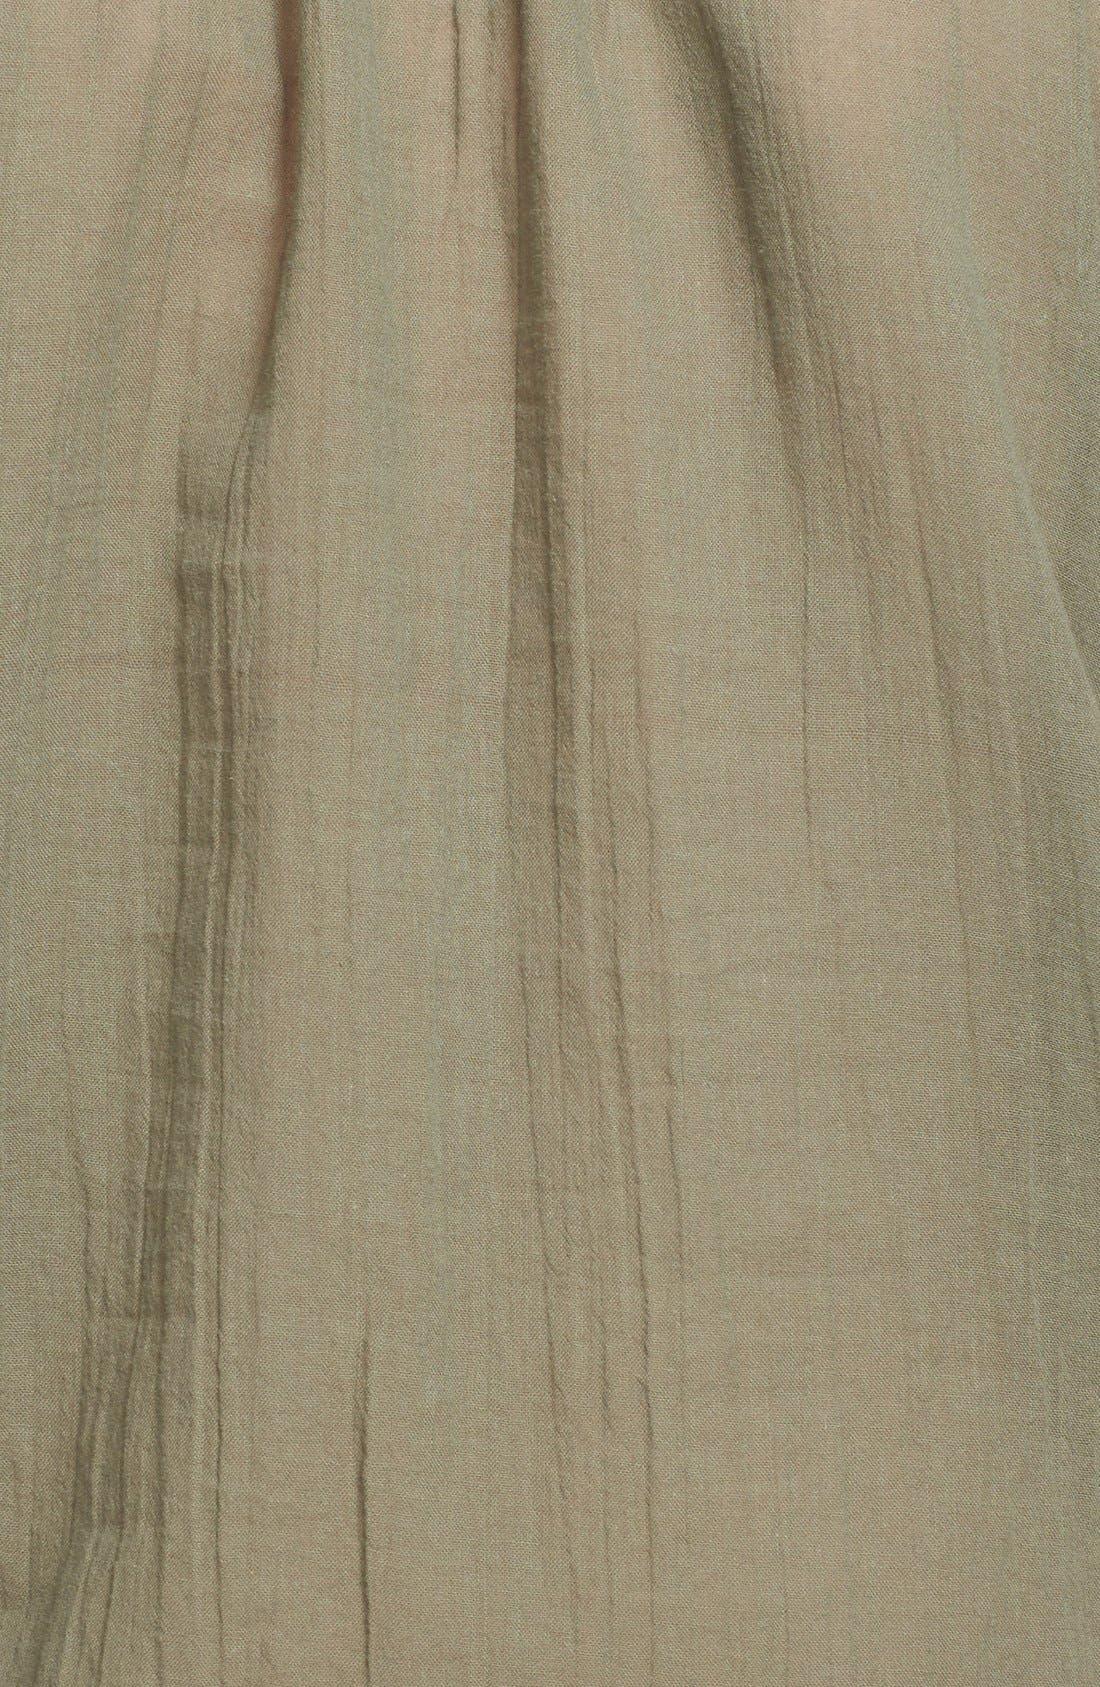 Alternate Image 5  - Joie 'Feray' Split Neck Embroidered Cotton Top